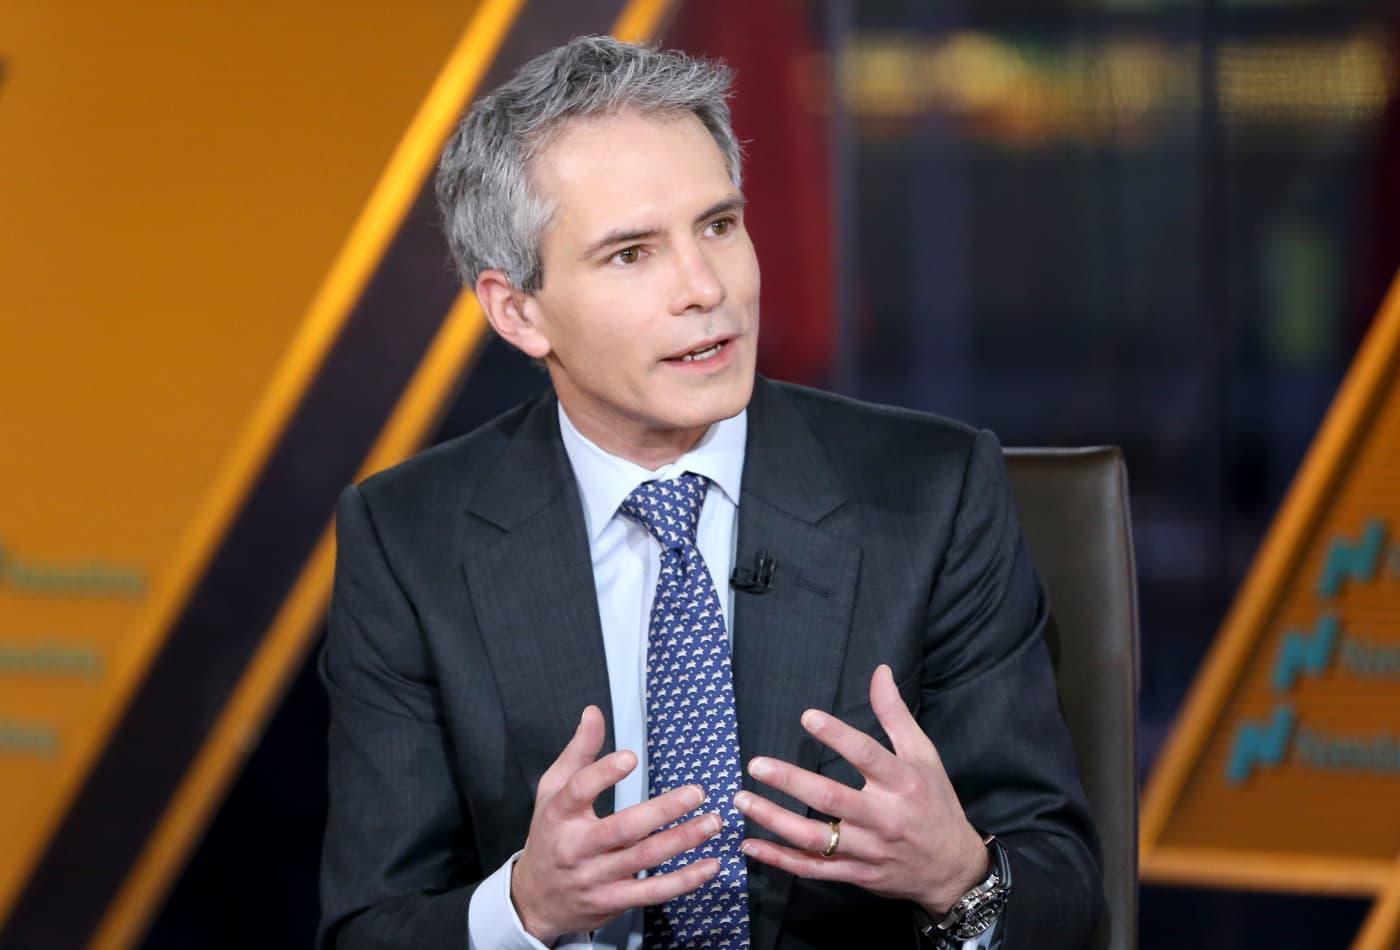 Investors should brace for multiple 5% market pullbacks, Blackstone's Joe Zidle warns